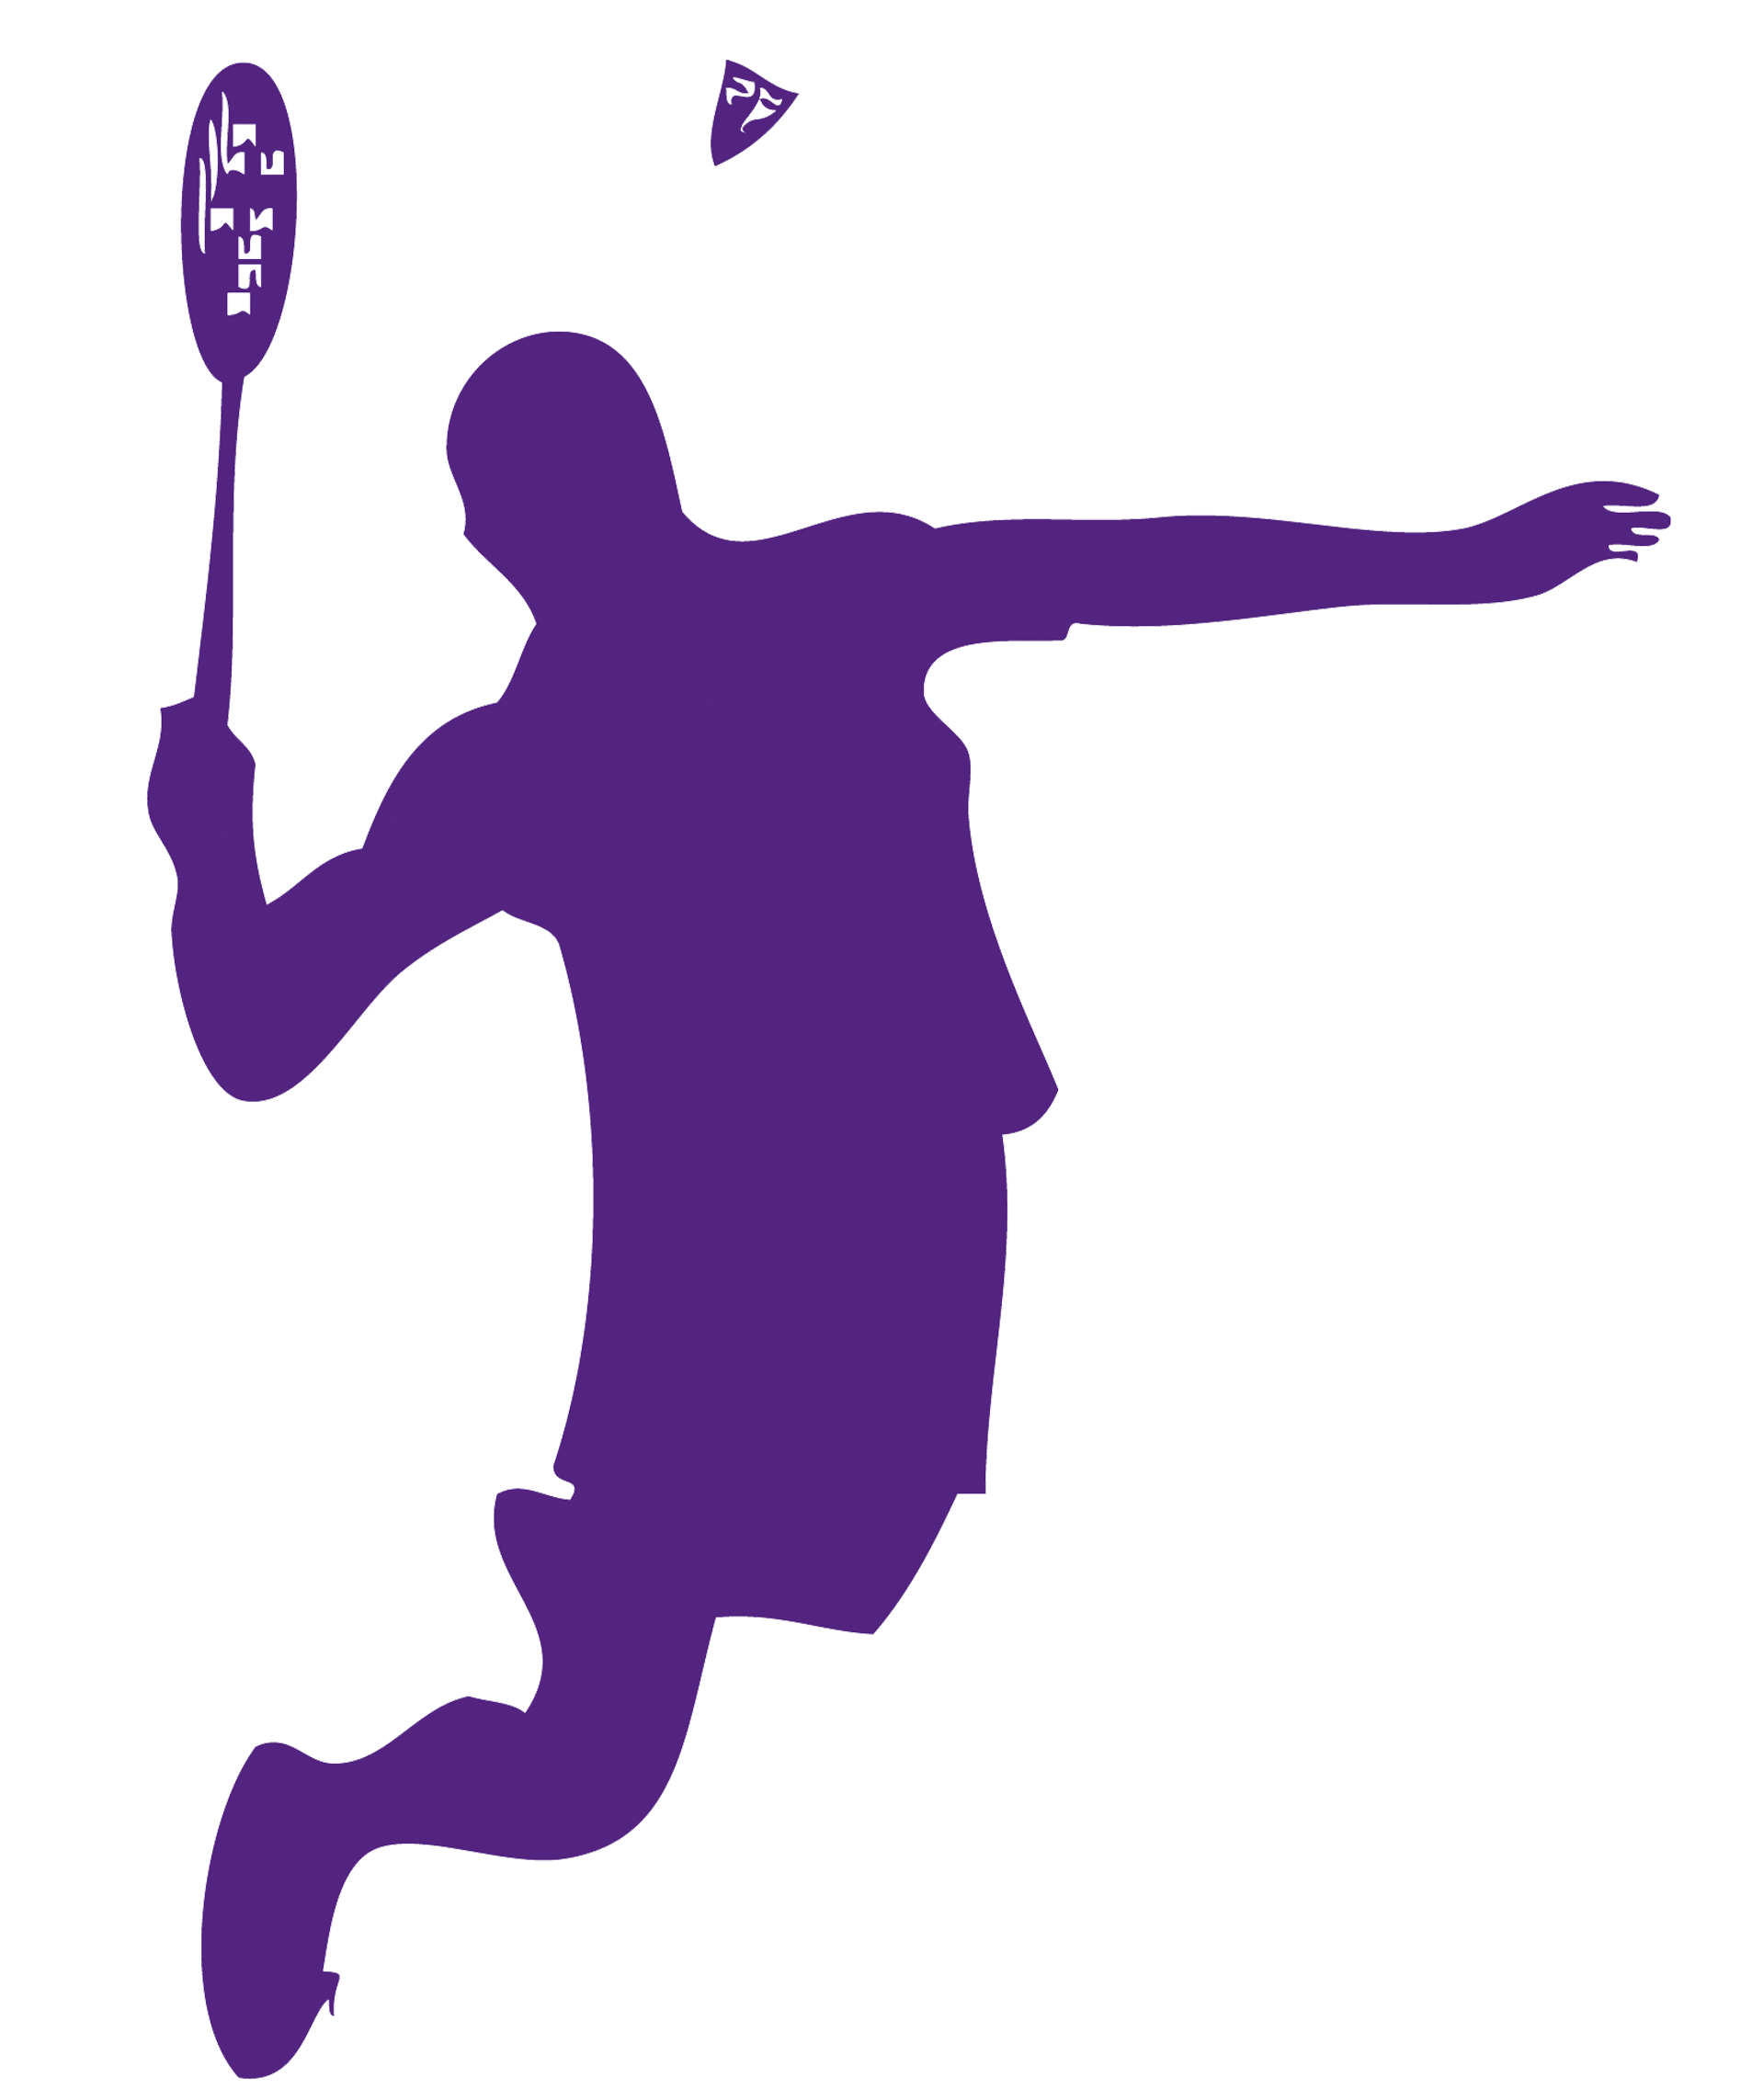 Badminton clipart vector free download download Free Badminton Png Images & Free Badminton Images.png Transparent ... download